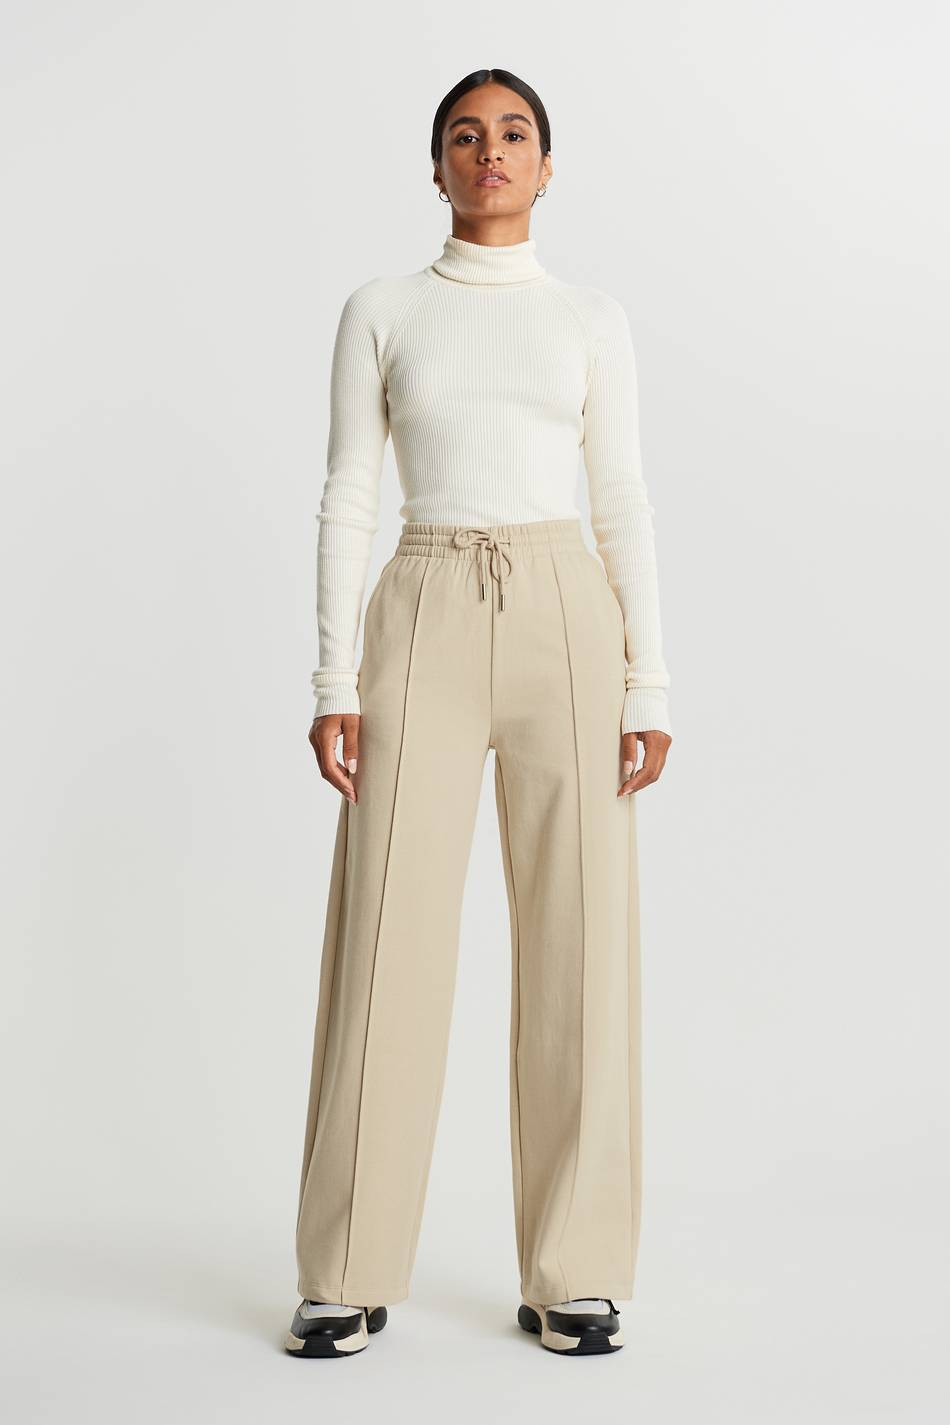 Gina Tricot Bonnie sweatpants S Female Brown rice (7316)